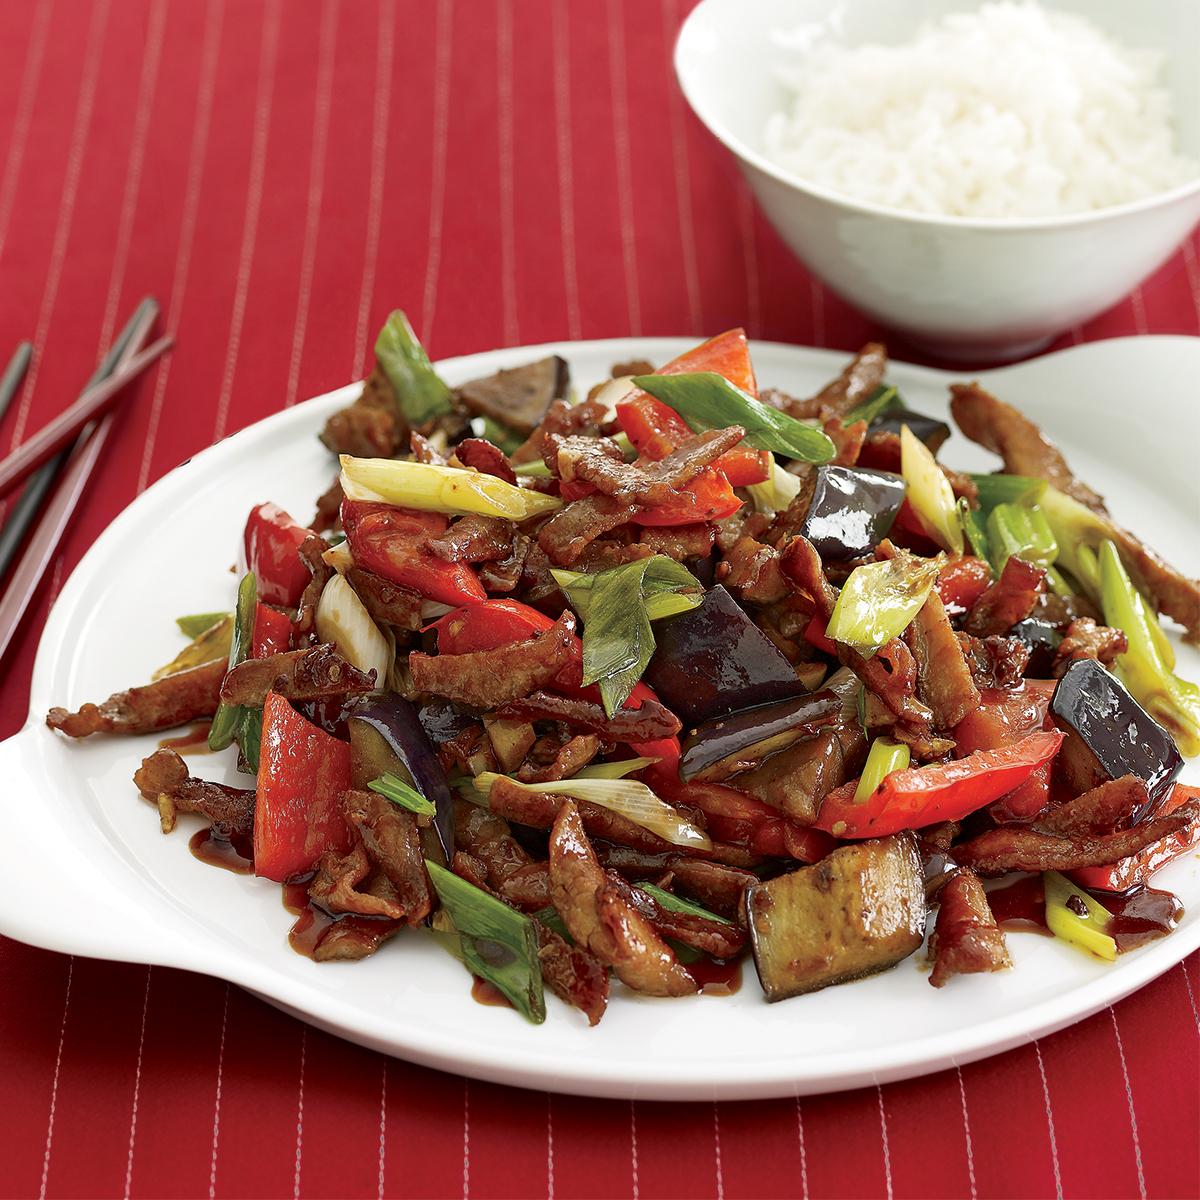 Pork and Bell Pepper Stir-Fry